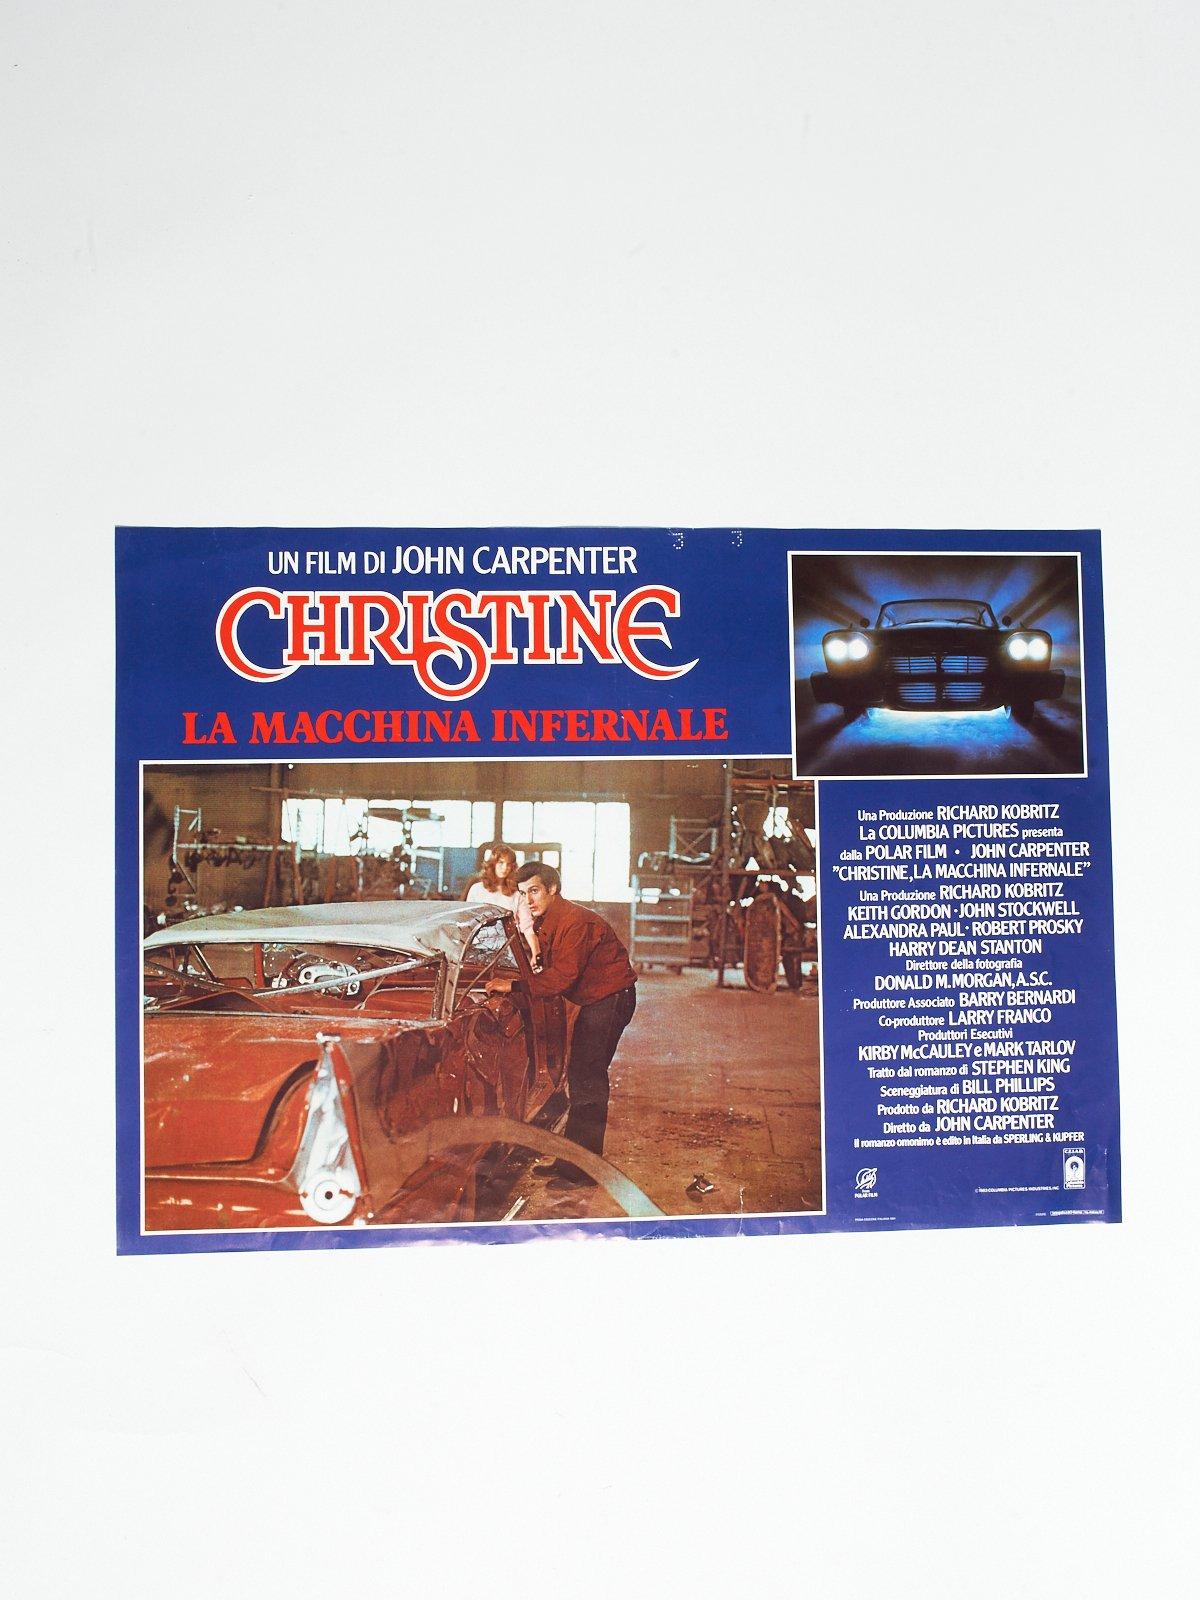 CHRISTINE LA MACCHINA INFERNALE LOBBY CARD